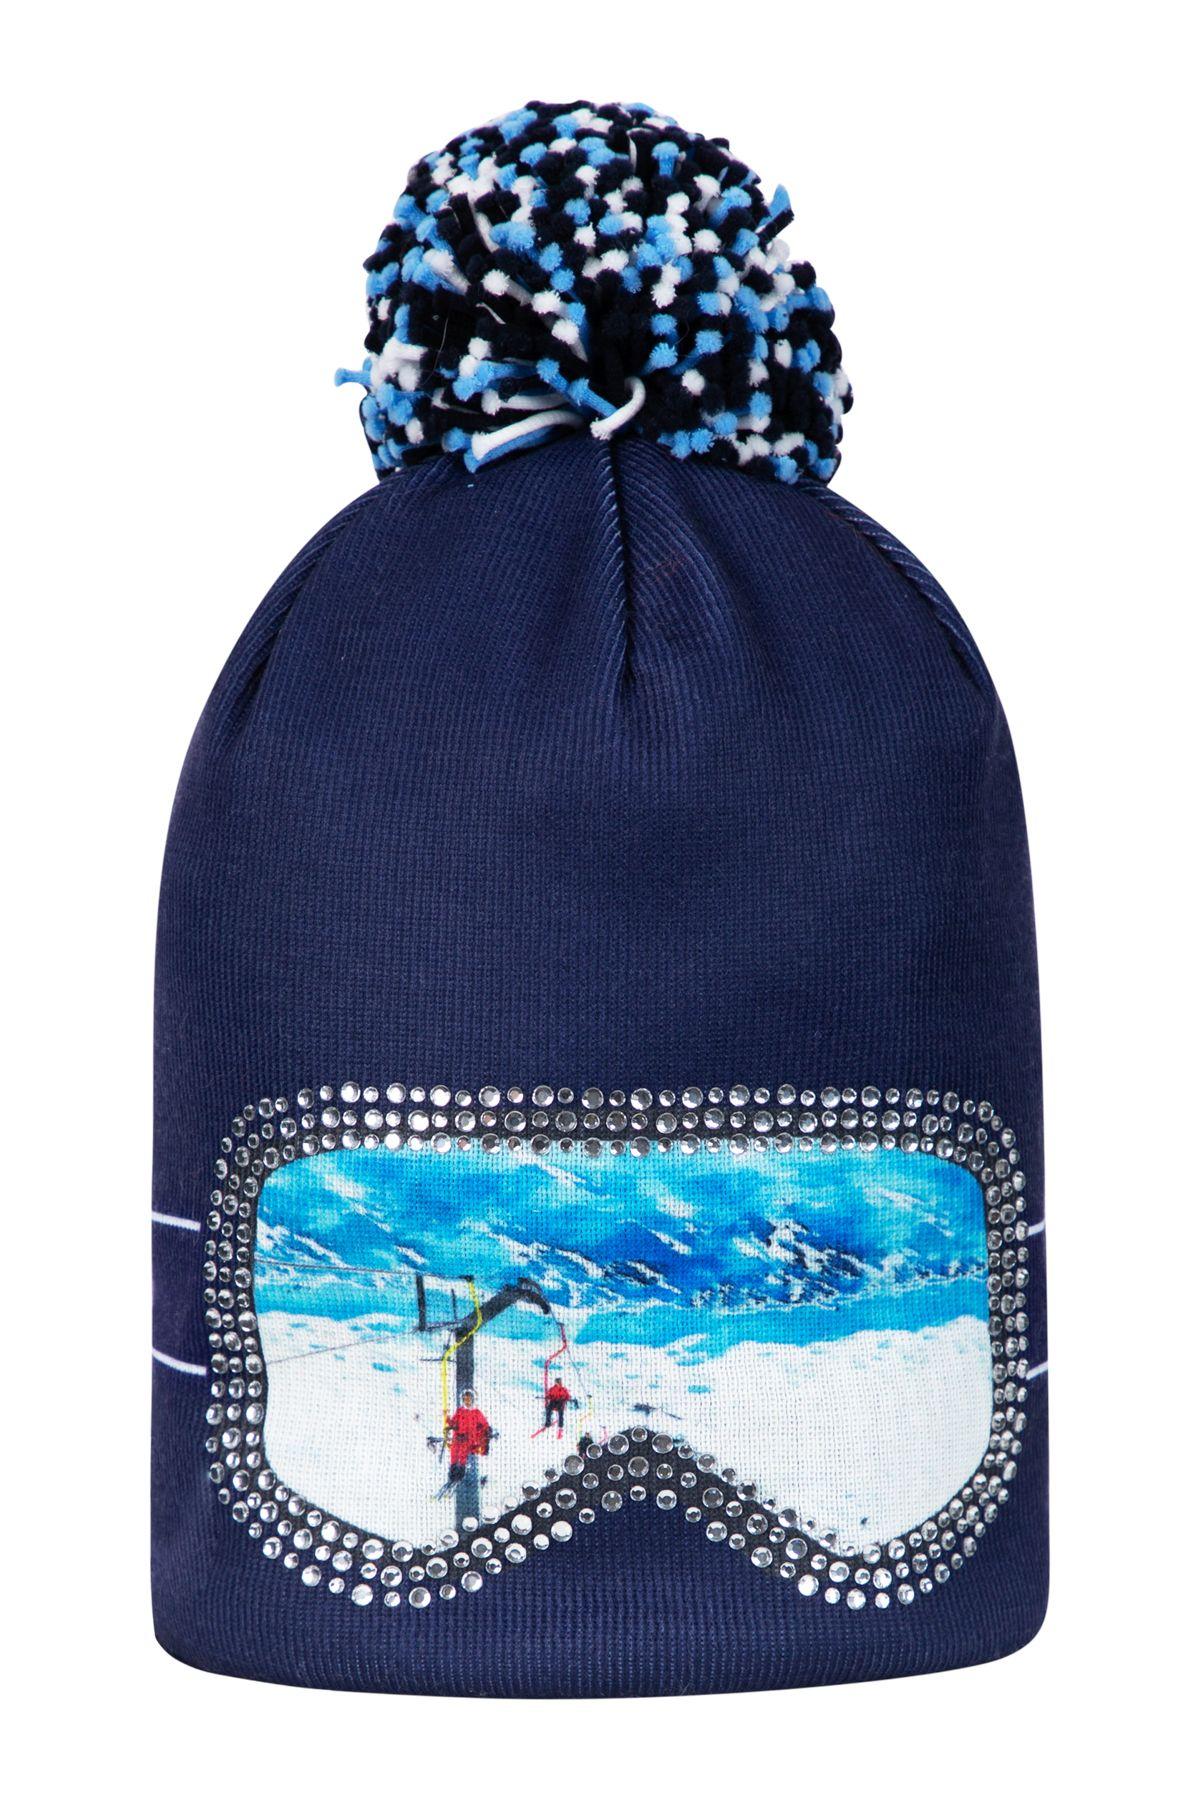 Sportalm Kitzbuehel Glasses 1953 Pom Pom hat perfect for winter ... b62273c05b5